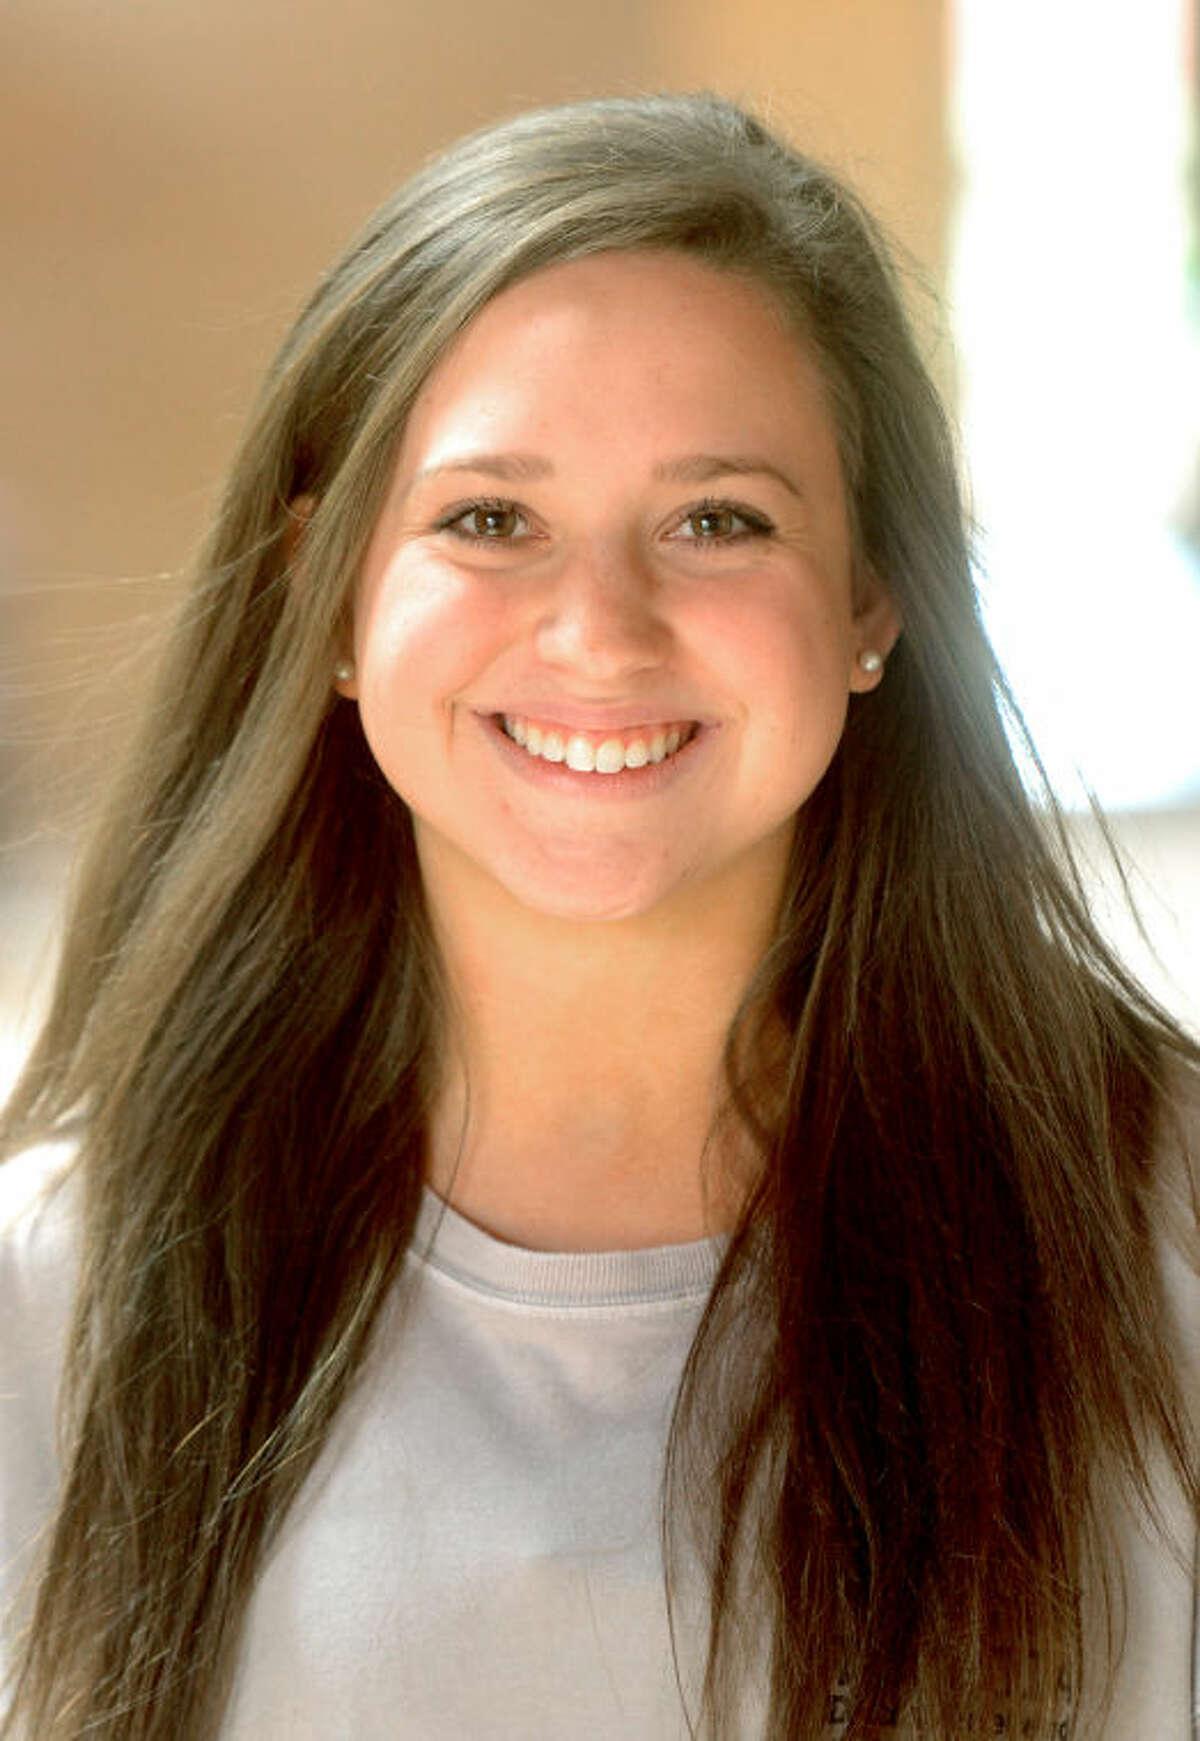 Alaina Carter is the senior Salutatorian at Trinity School. James Durbin/Reporter-Telegram